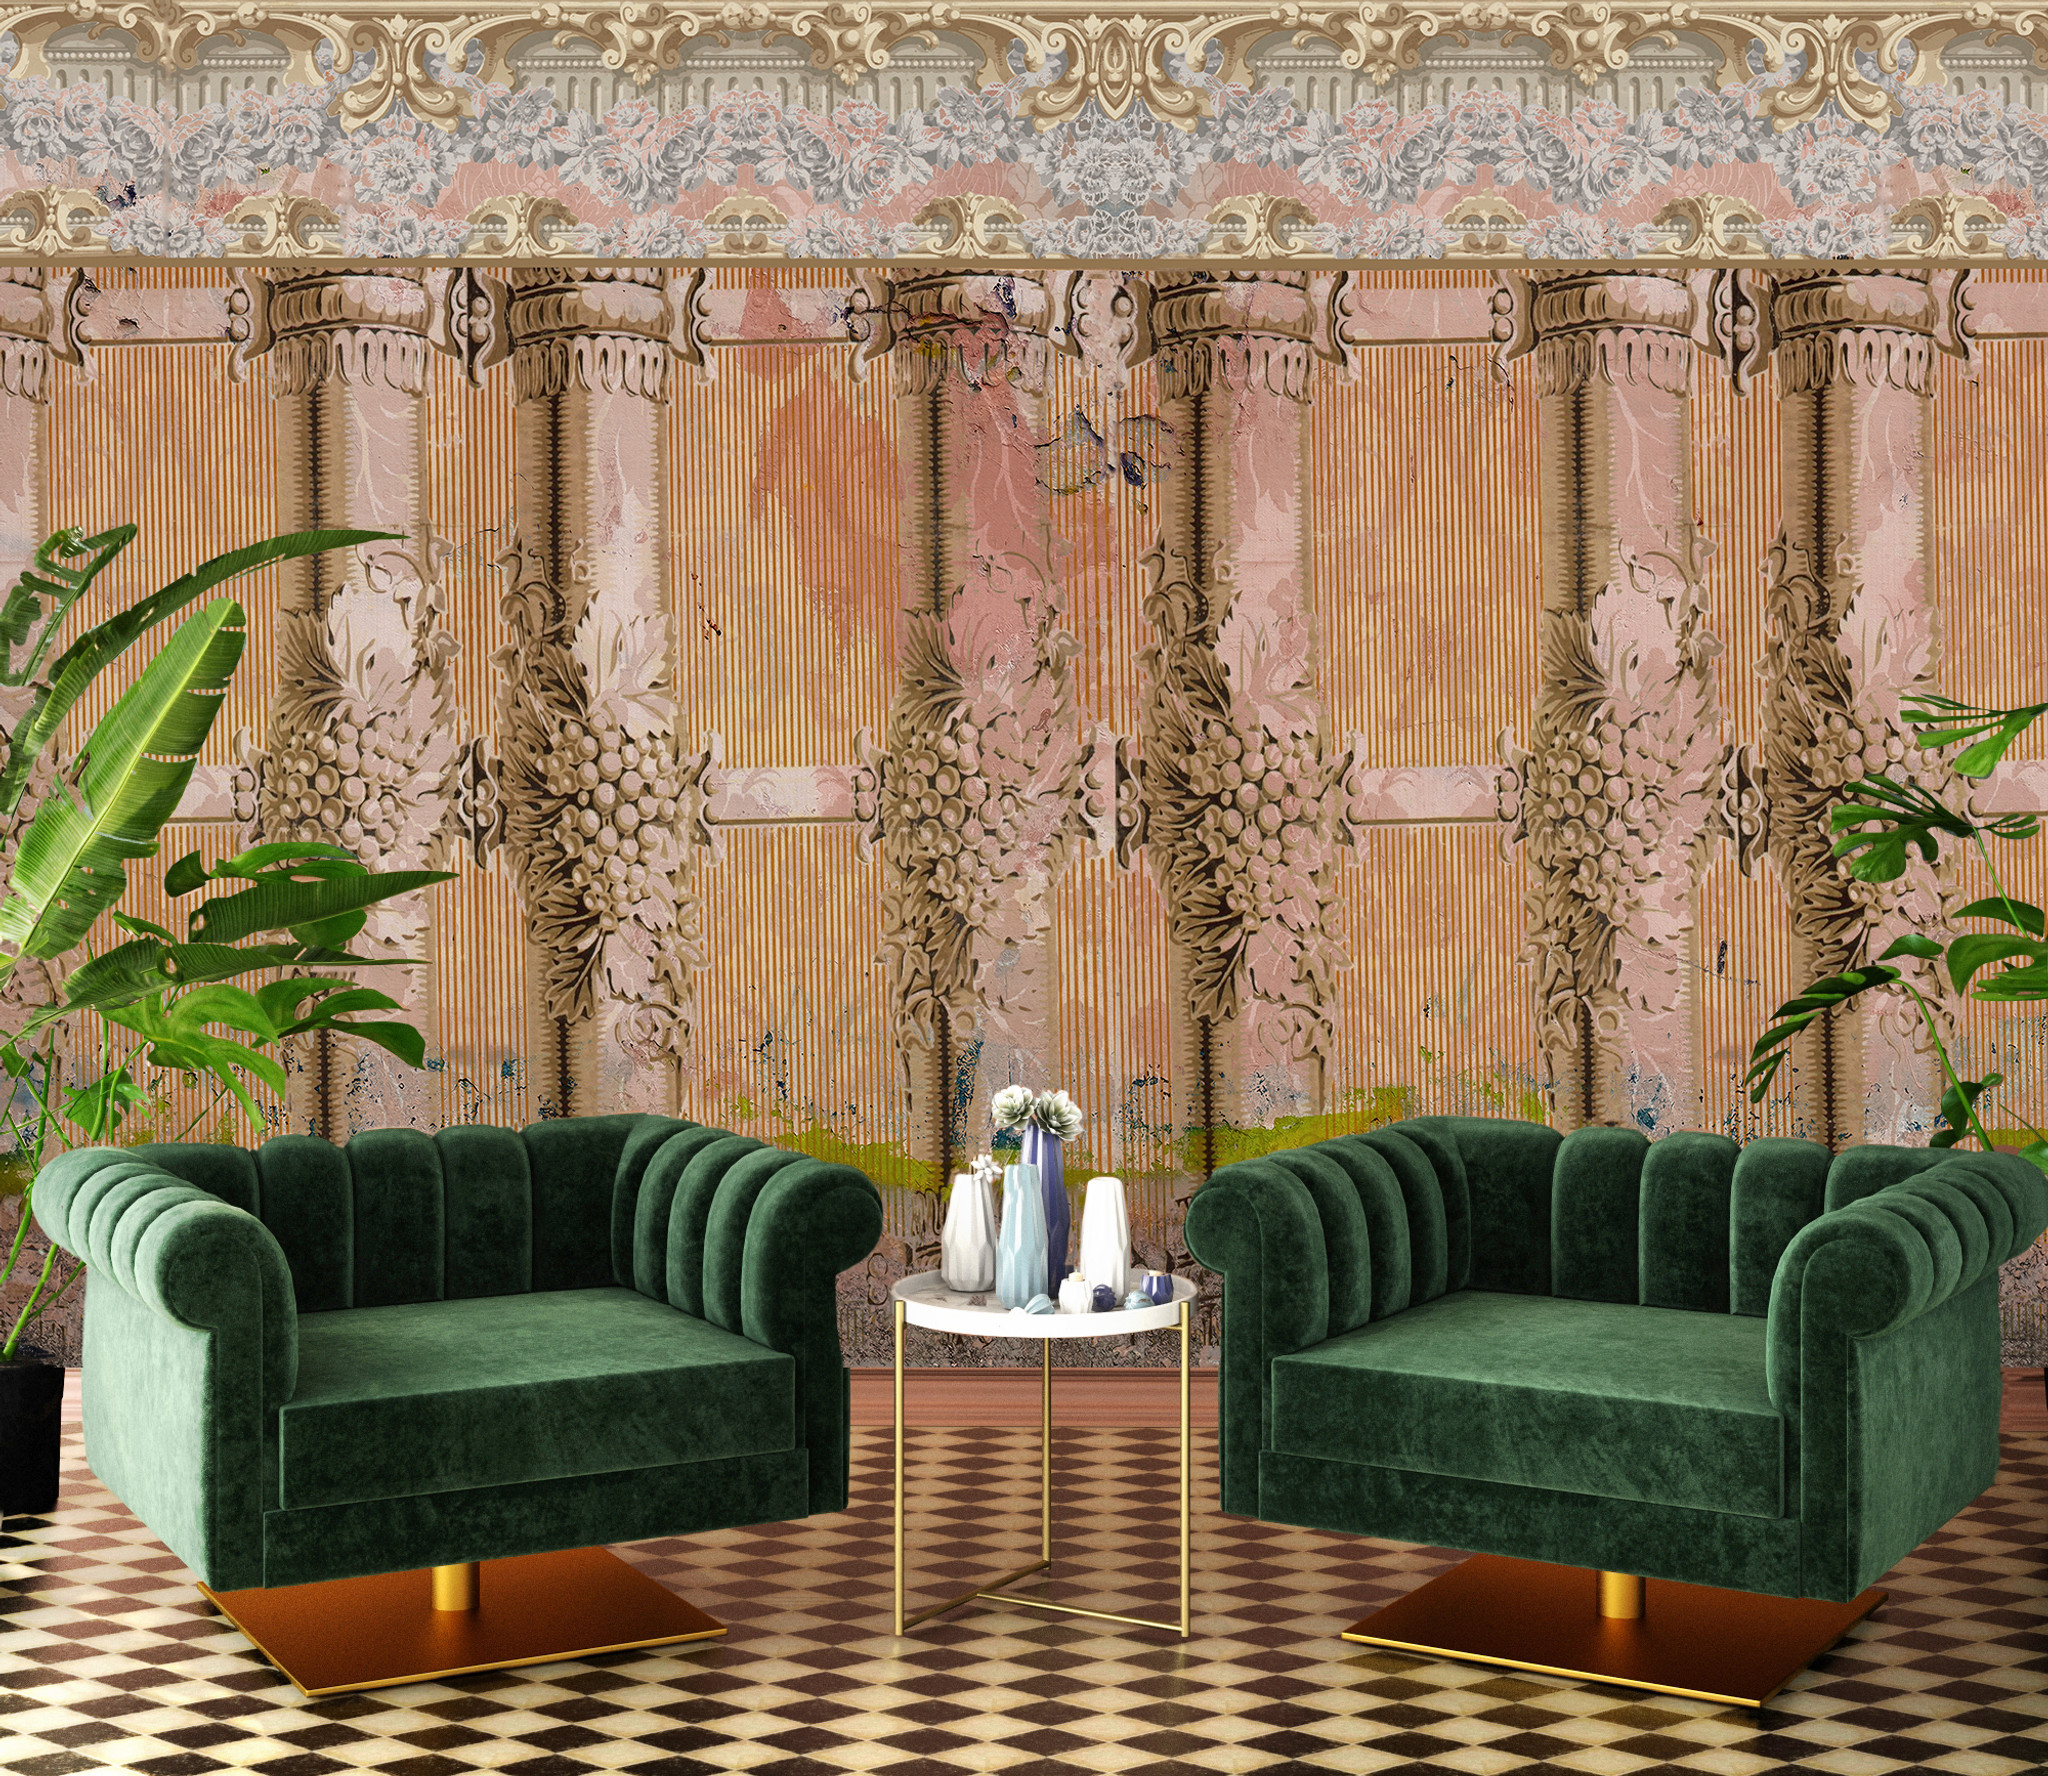 Wallpaper - Faded Empire - Villa Rosa